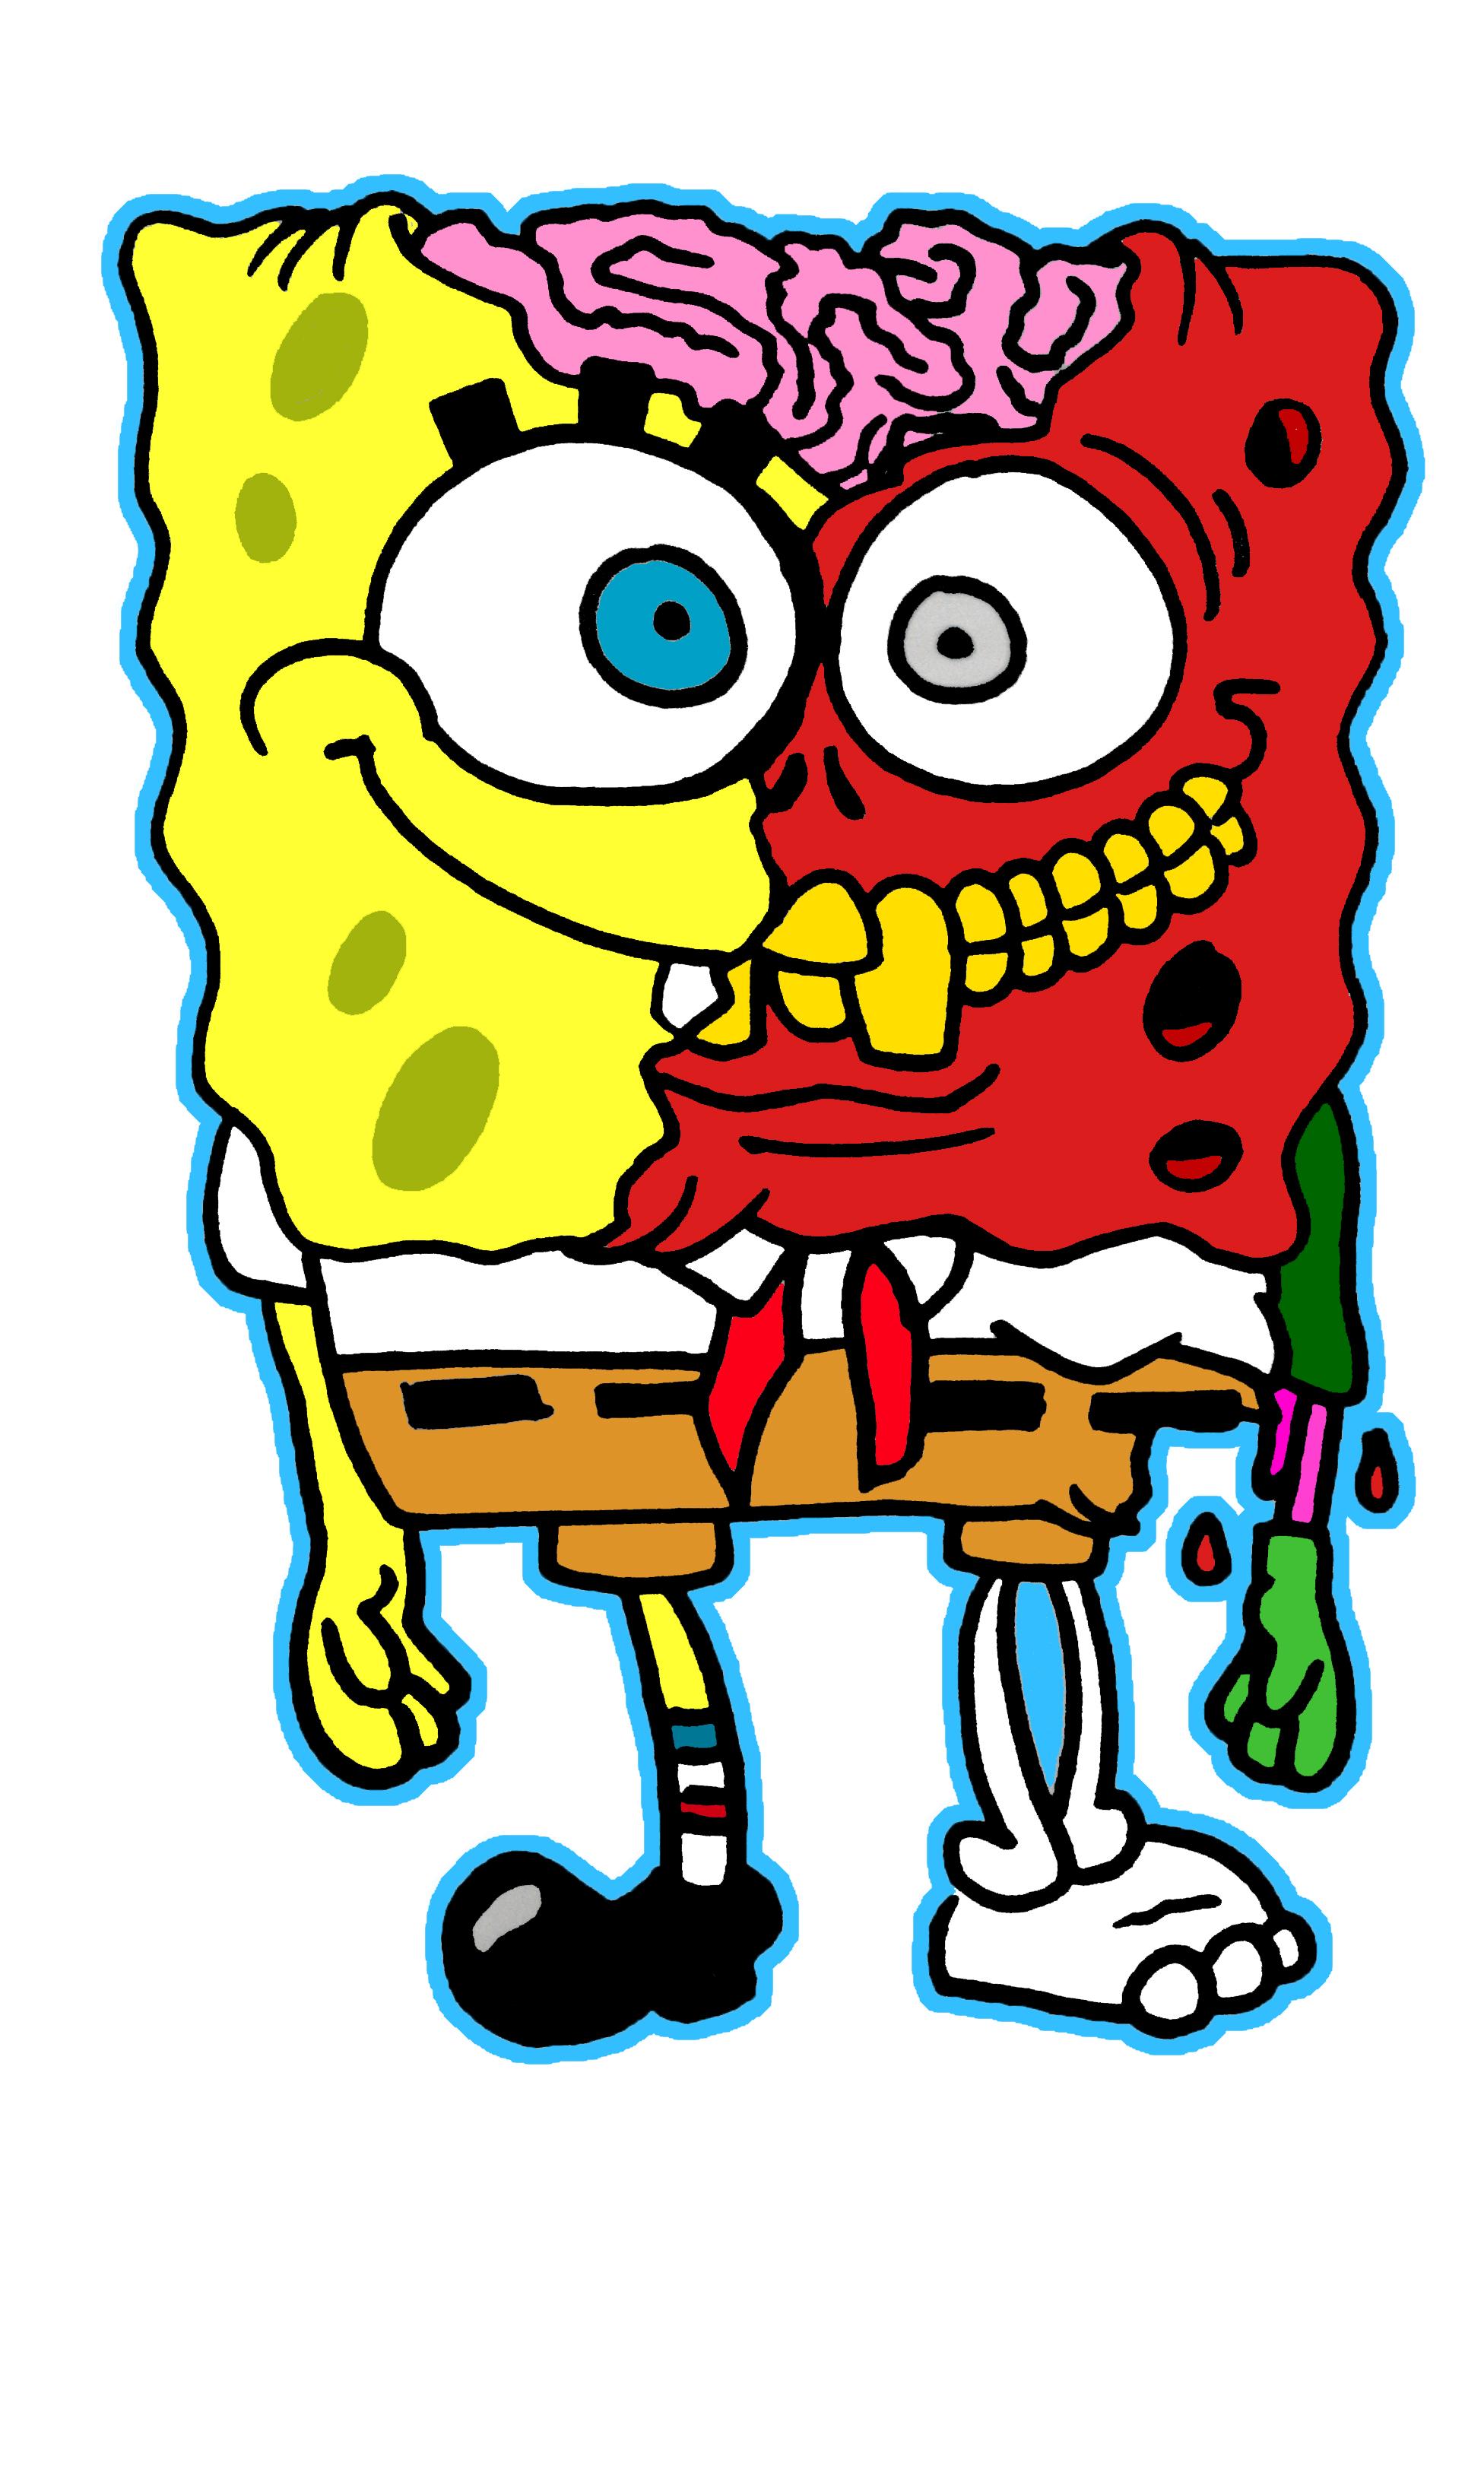 Keren 30 Gambar Grafiti Kartun Spongebob Gambar Kartun Ku